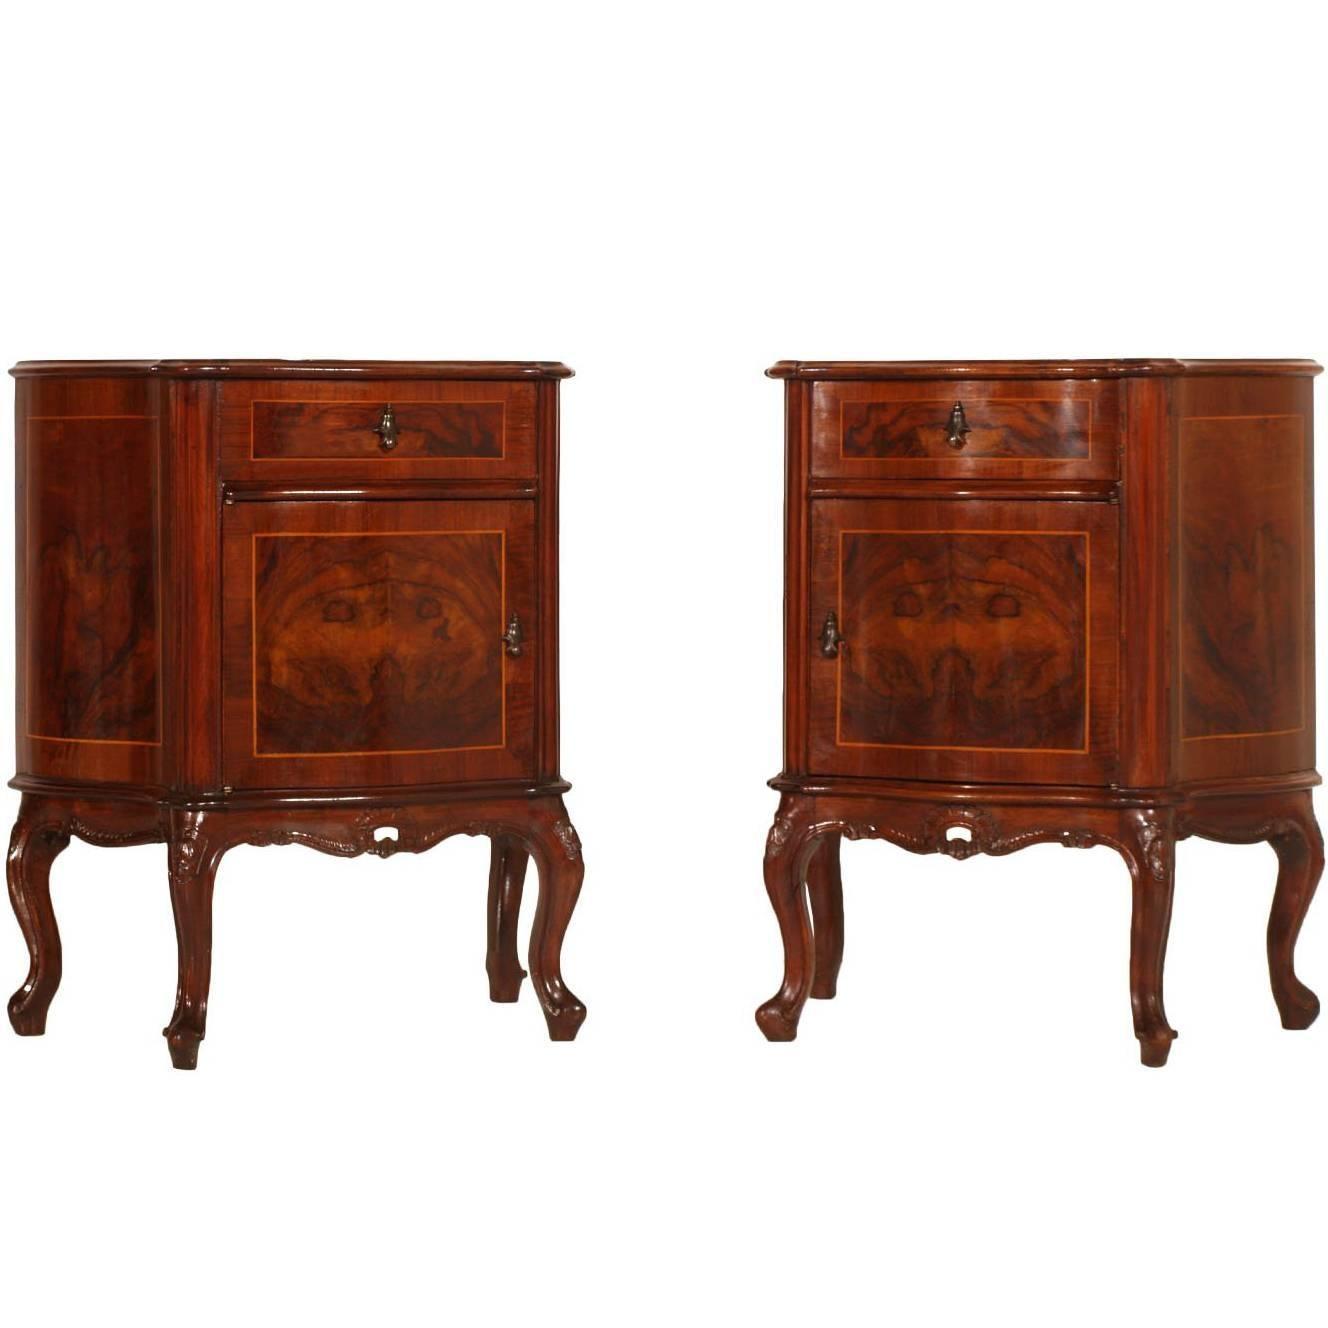 Venetian Baroque Pair of Nightstands in Carved walnut & Burl walnut with Inlay